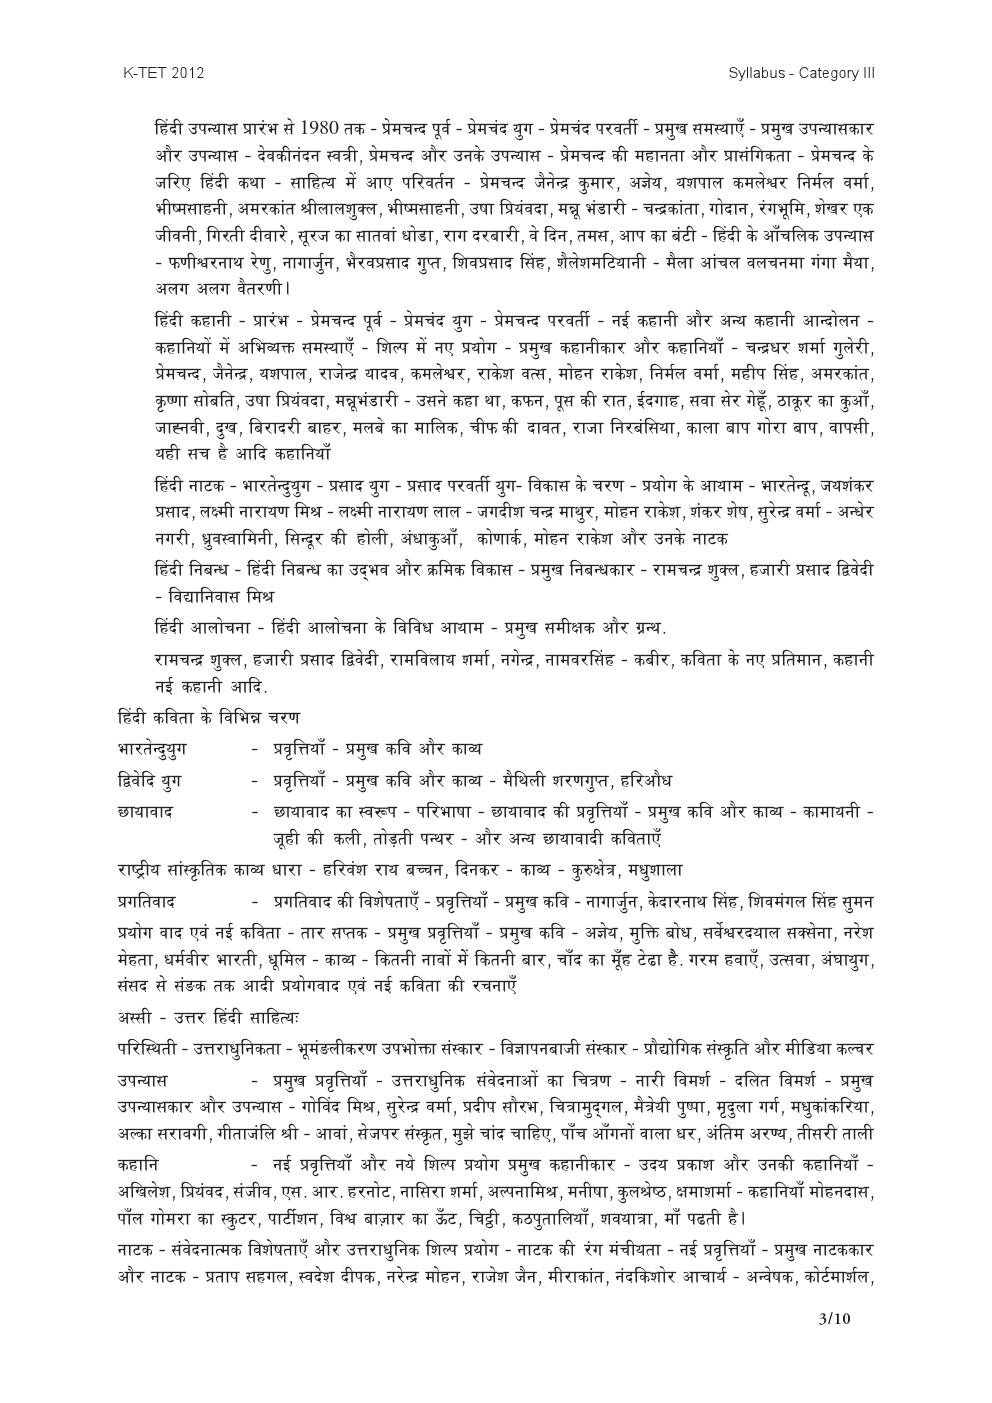 http://masterstudy.net/pdf/syllabus30010.jpg